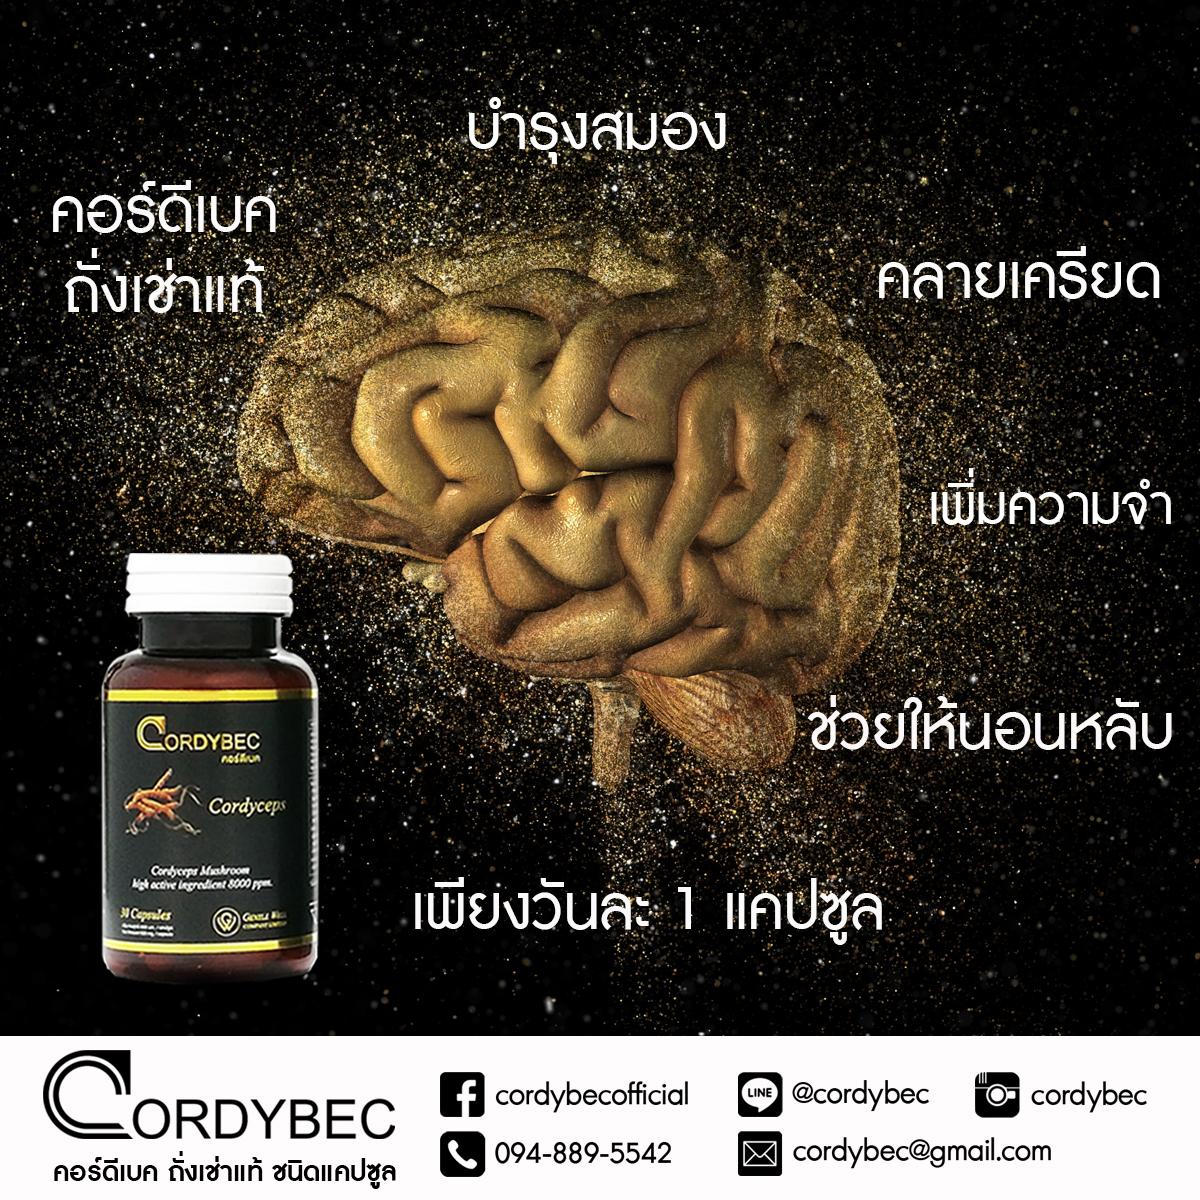 Cordybec Brain 002